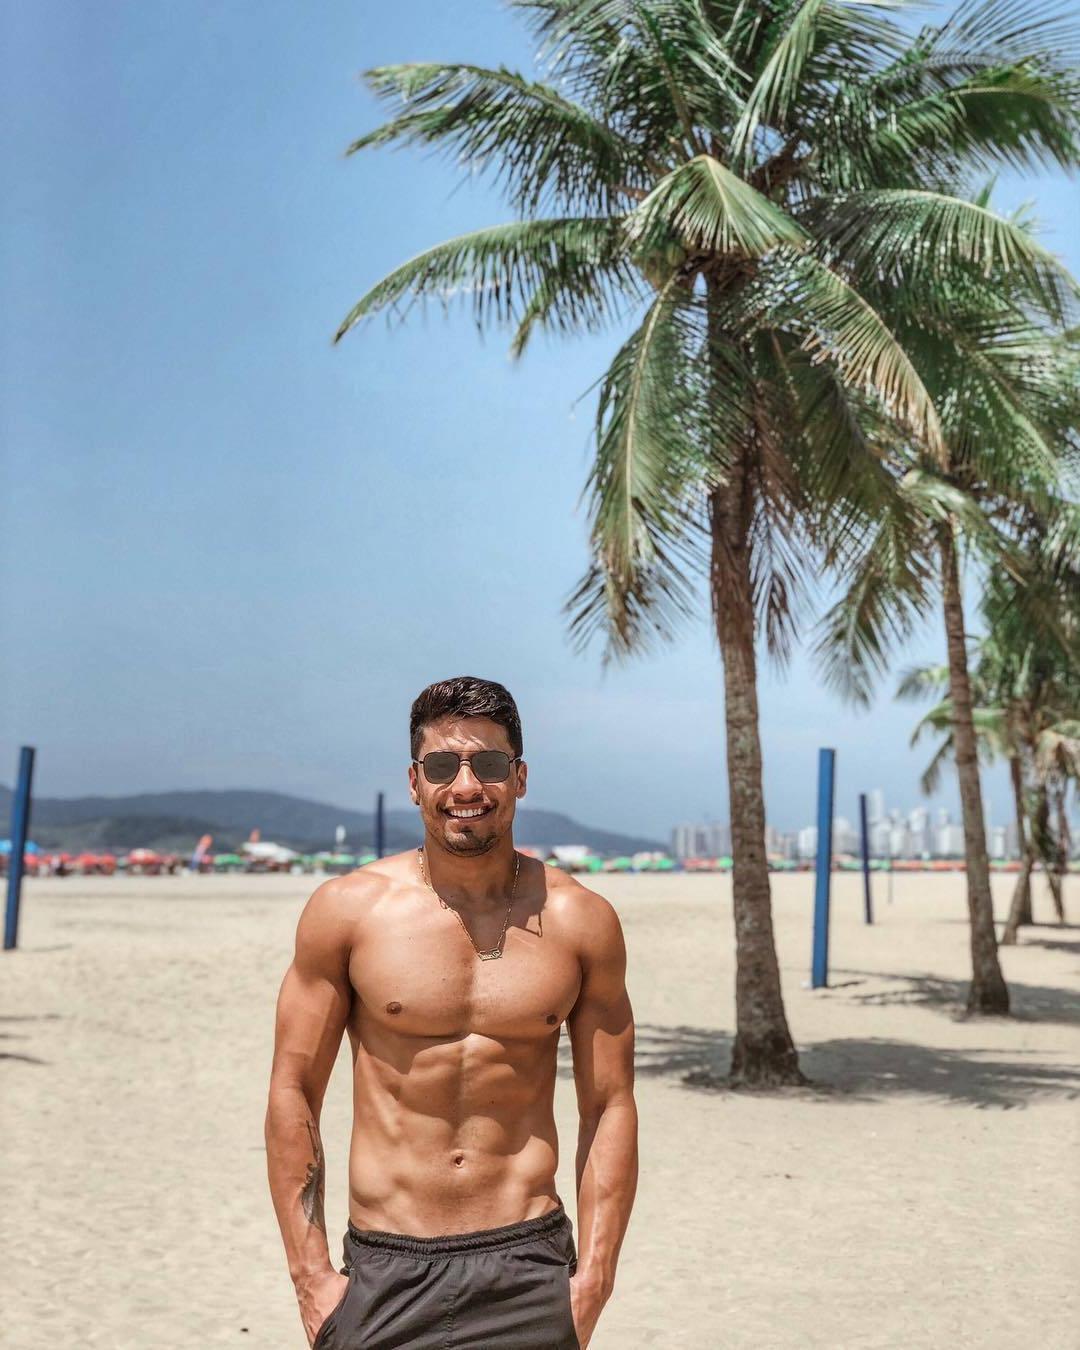 sexiest-turkish-guys-shirtless-fit-body-muscular-pecs-smiling-indian-hunks